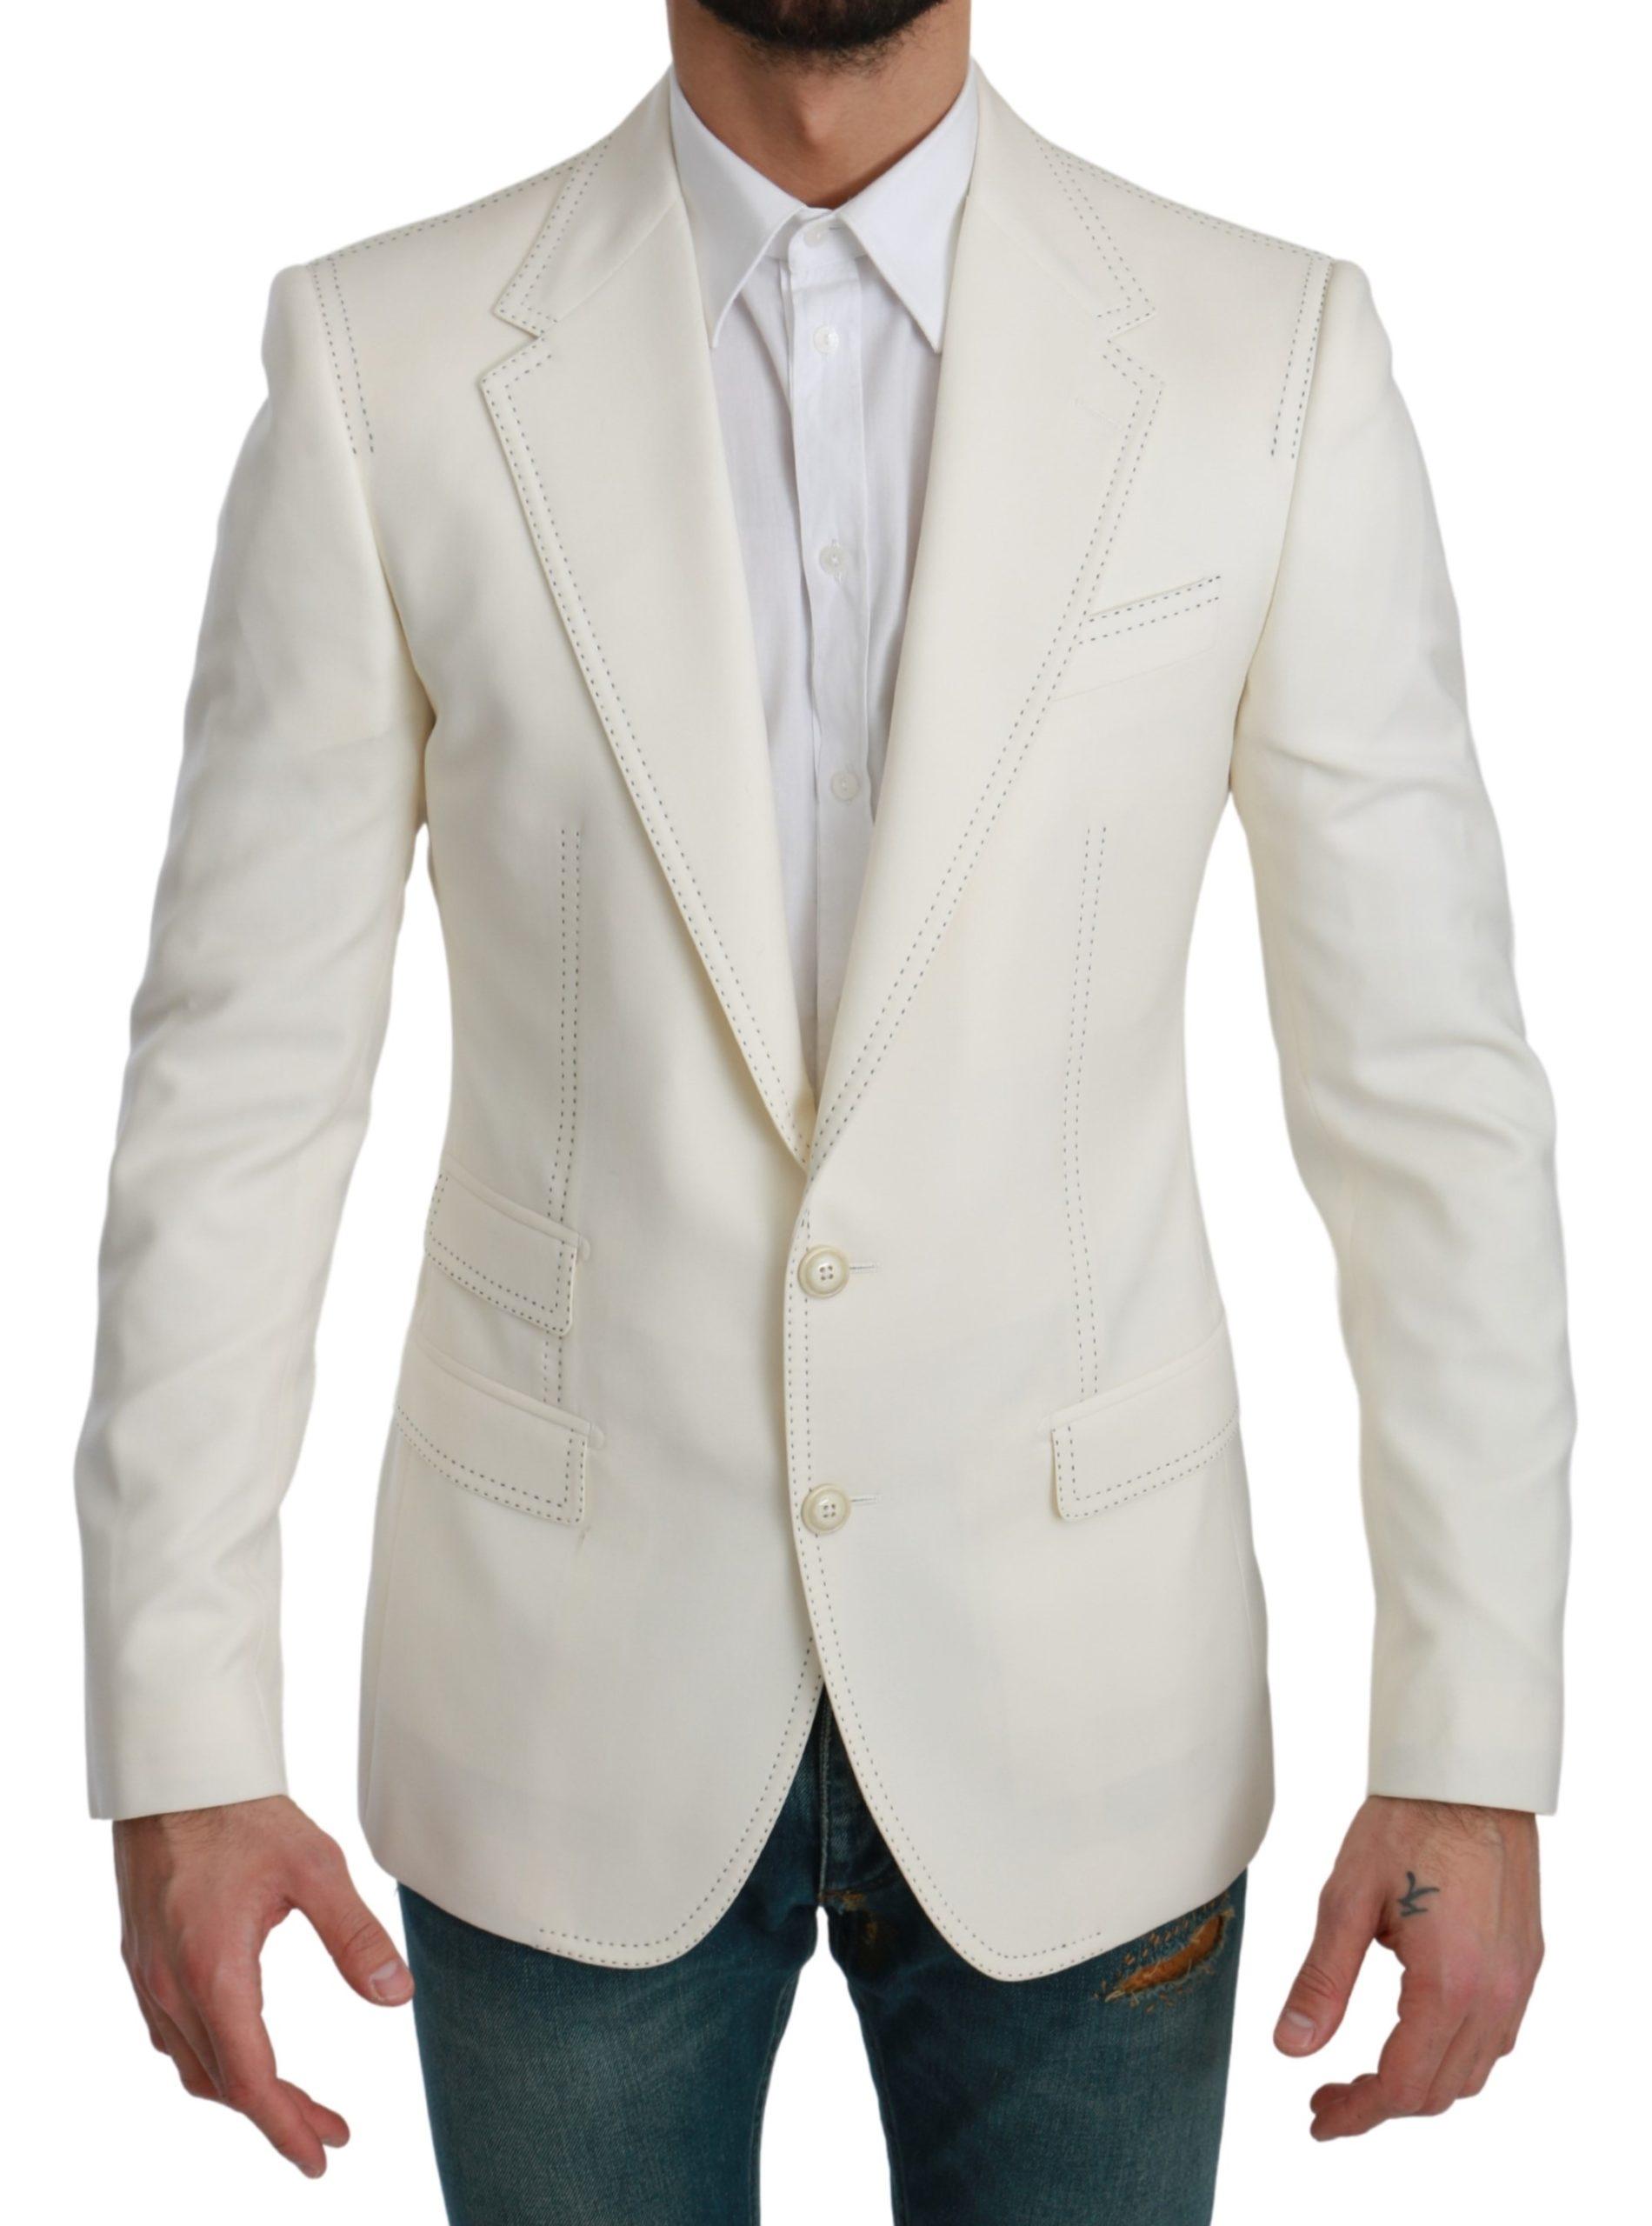 Dolce & Gabbana Men's Single Breasted Formal Blazer White KOS1708 - IT46 | S